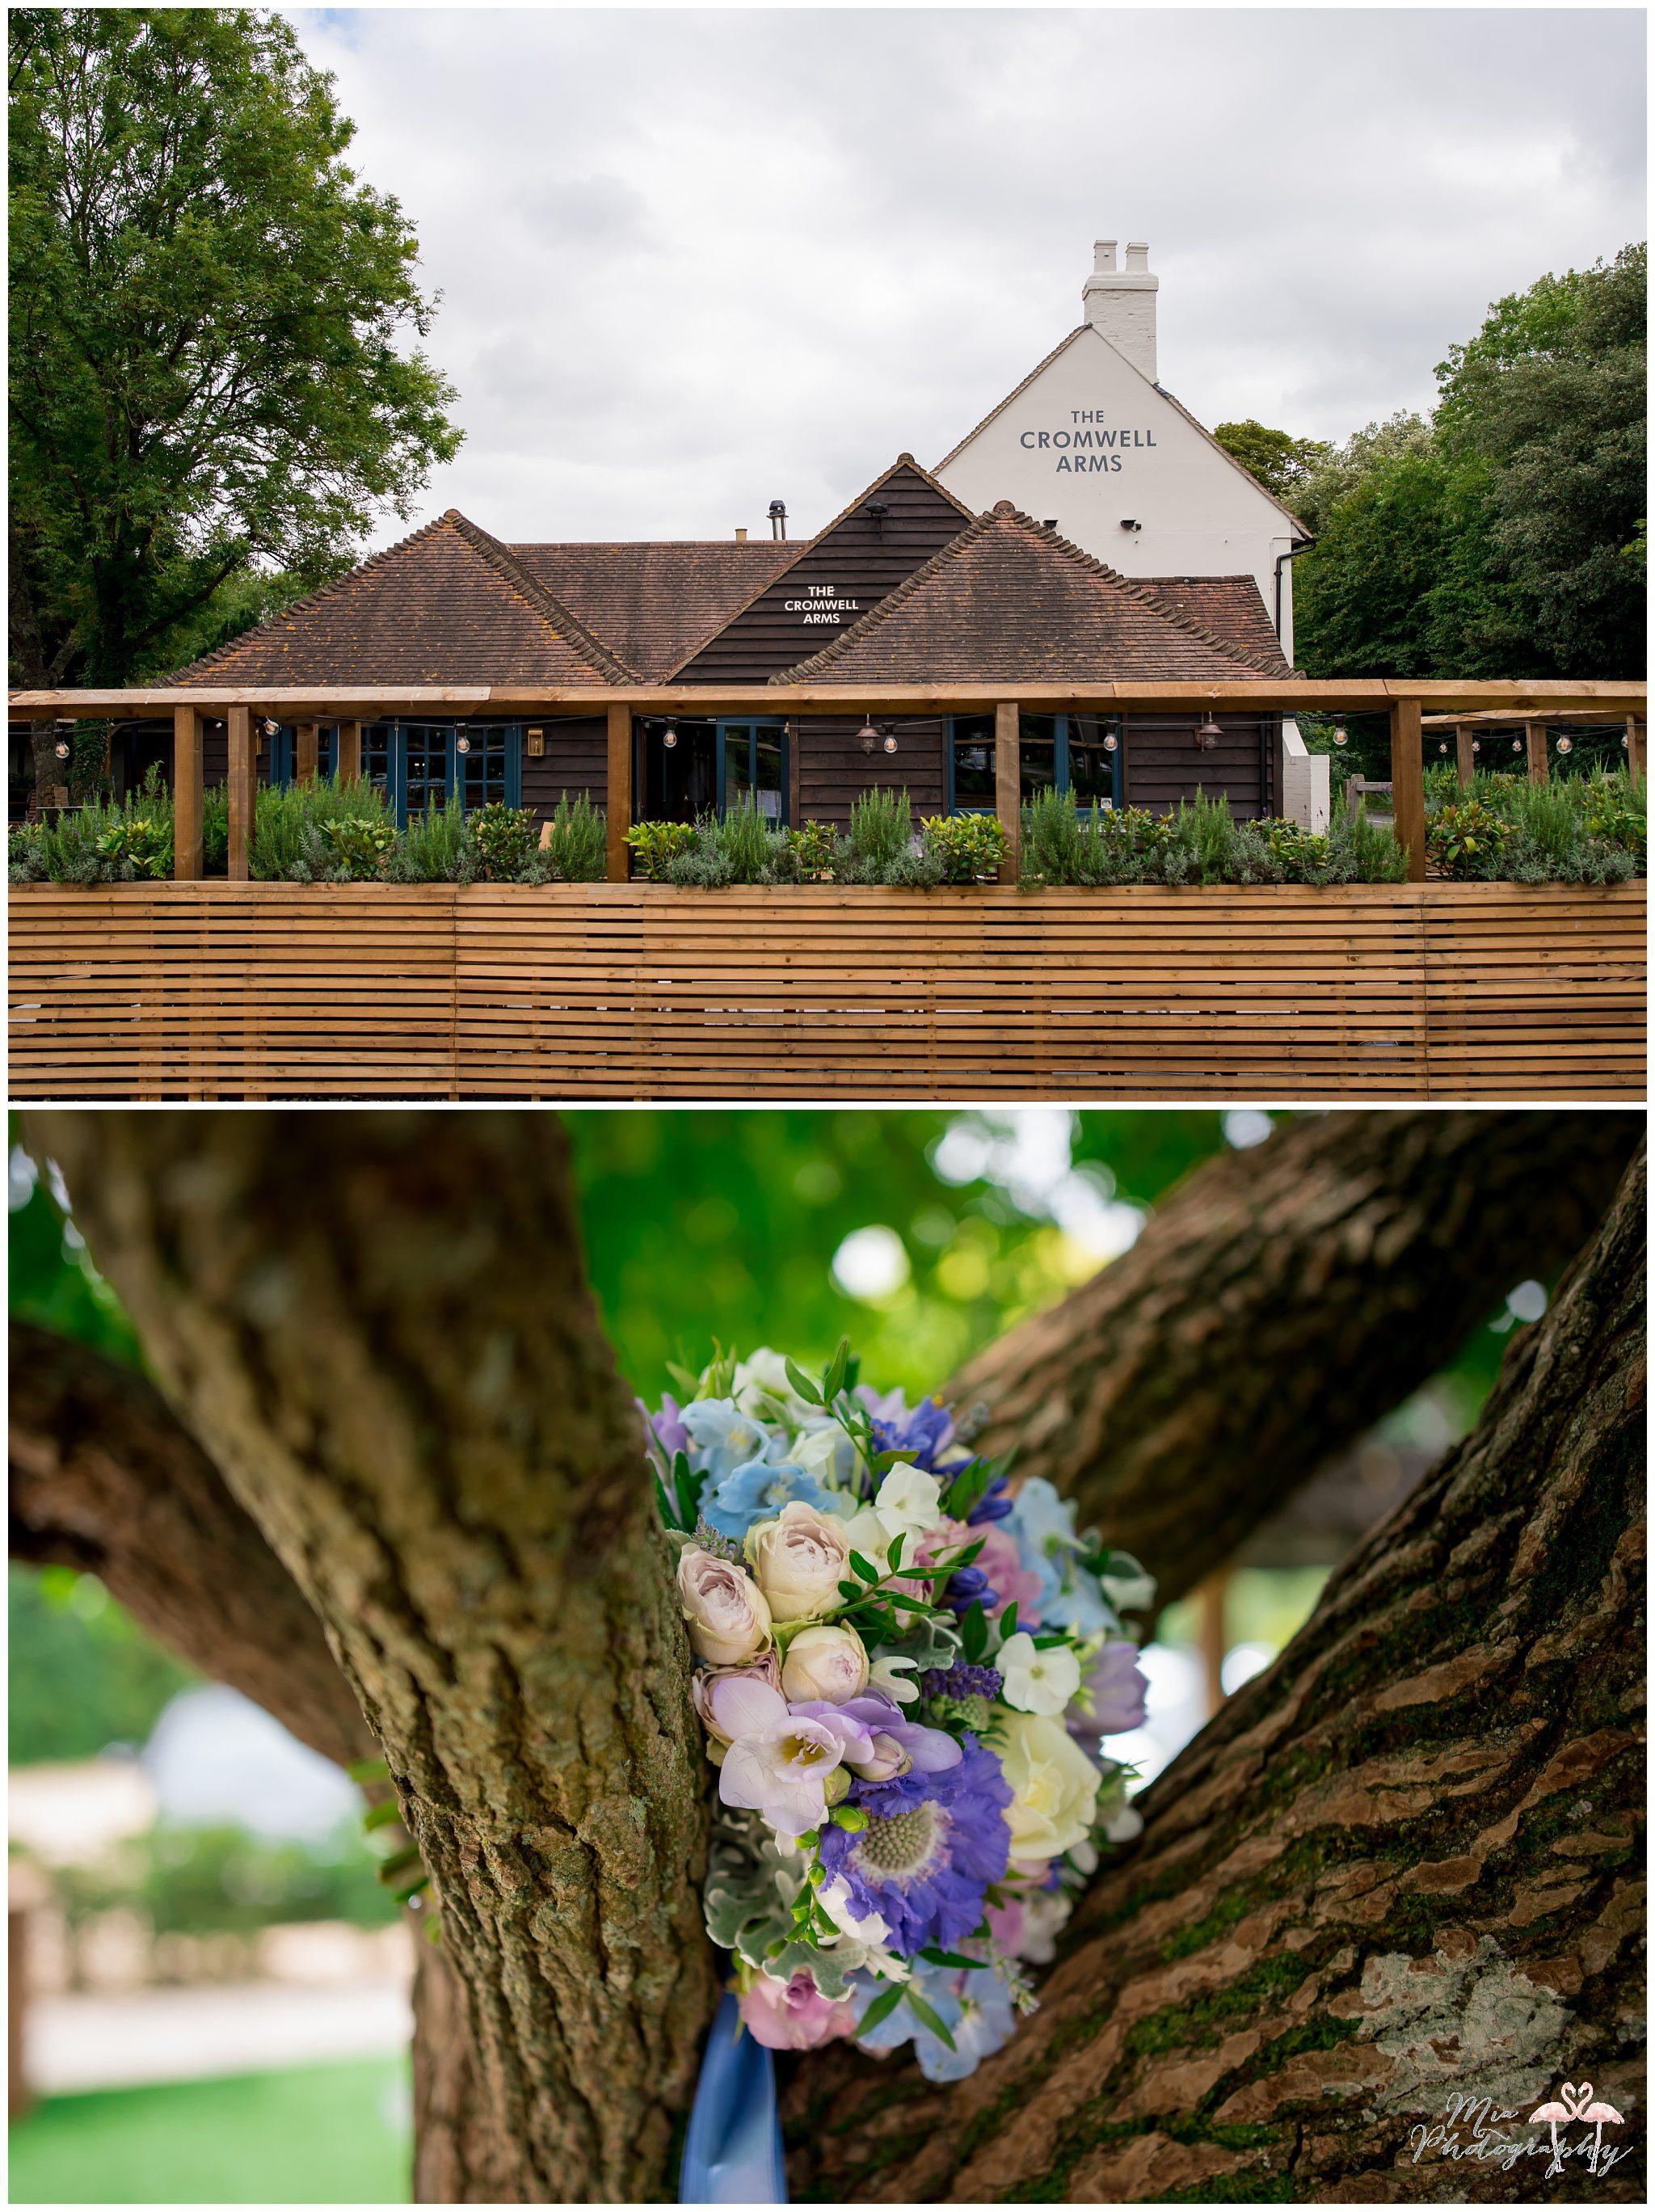 Hanger Farm wedding photography